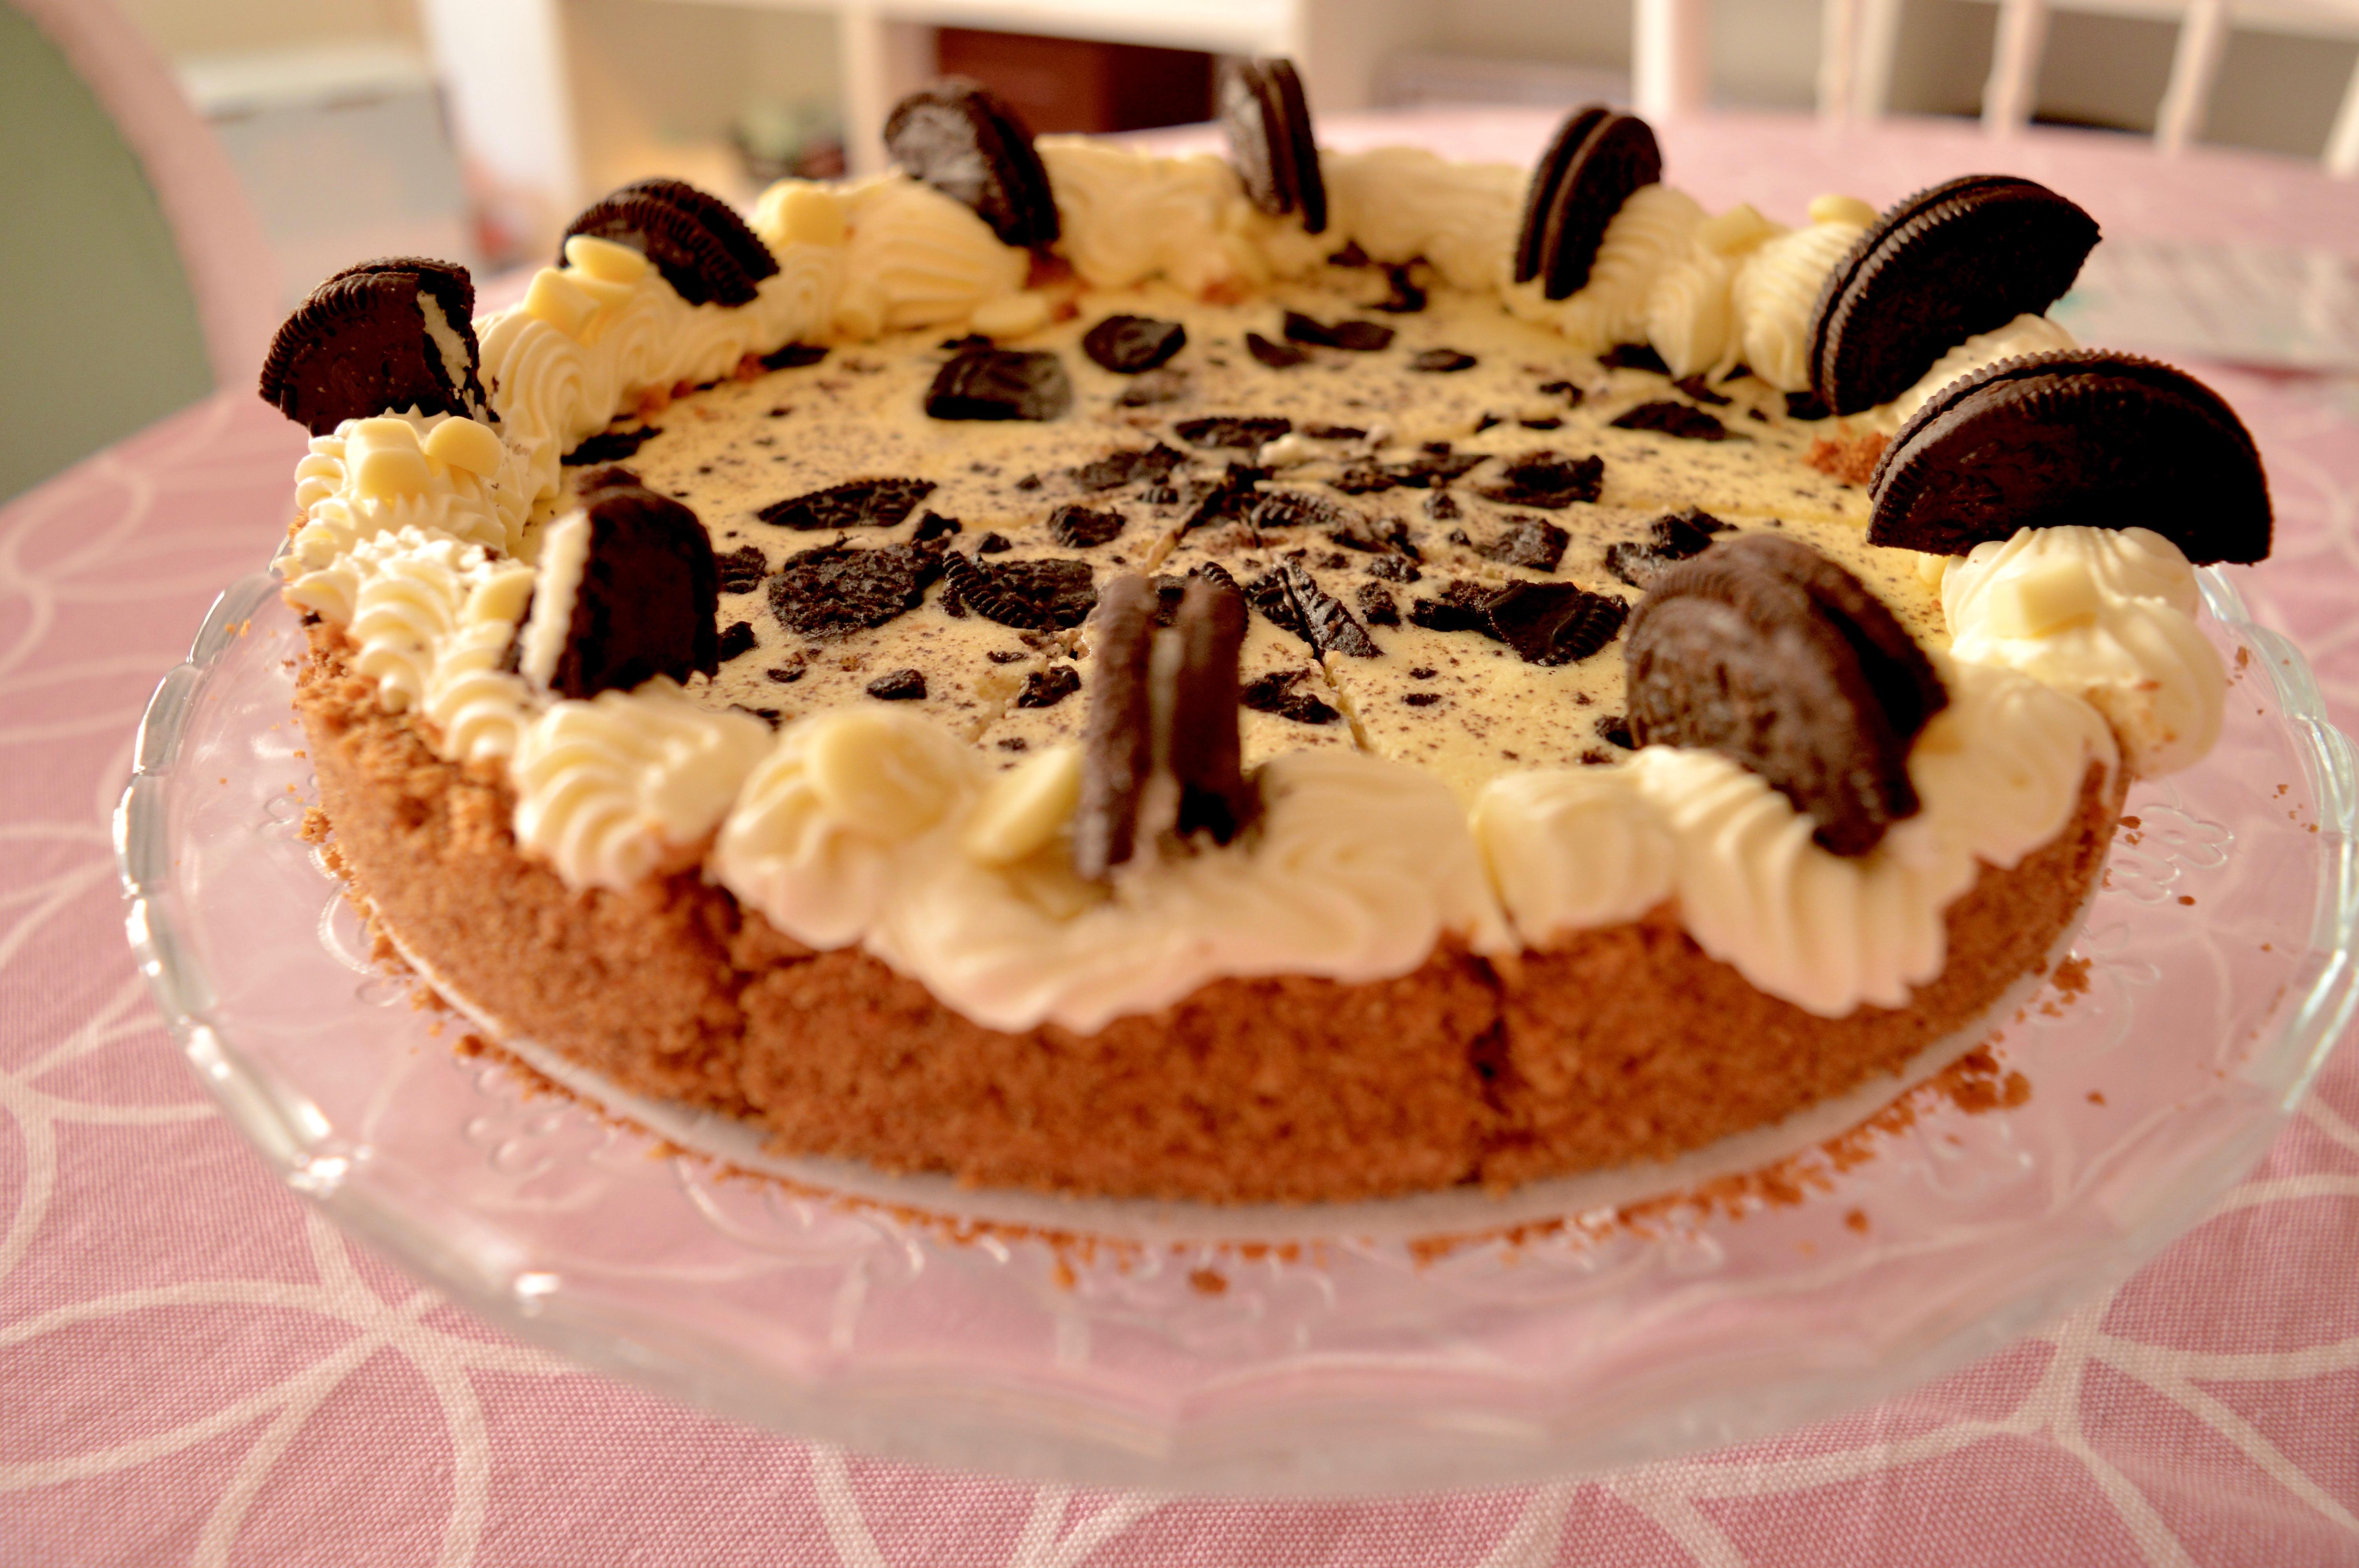 Oreo's cheesecake bestellen den Haag, Oreo's cupcakes